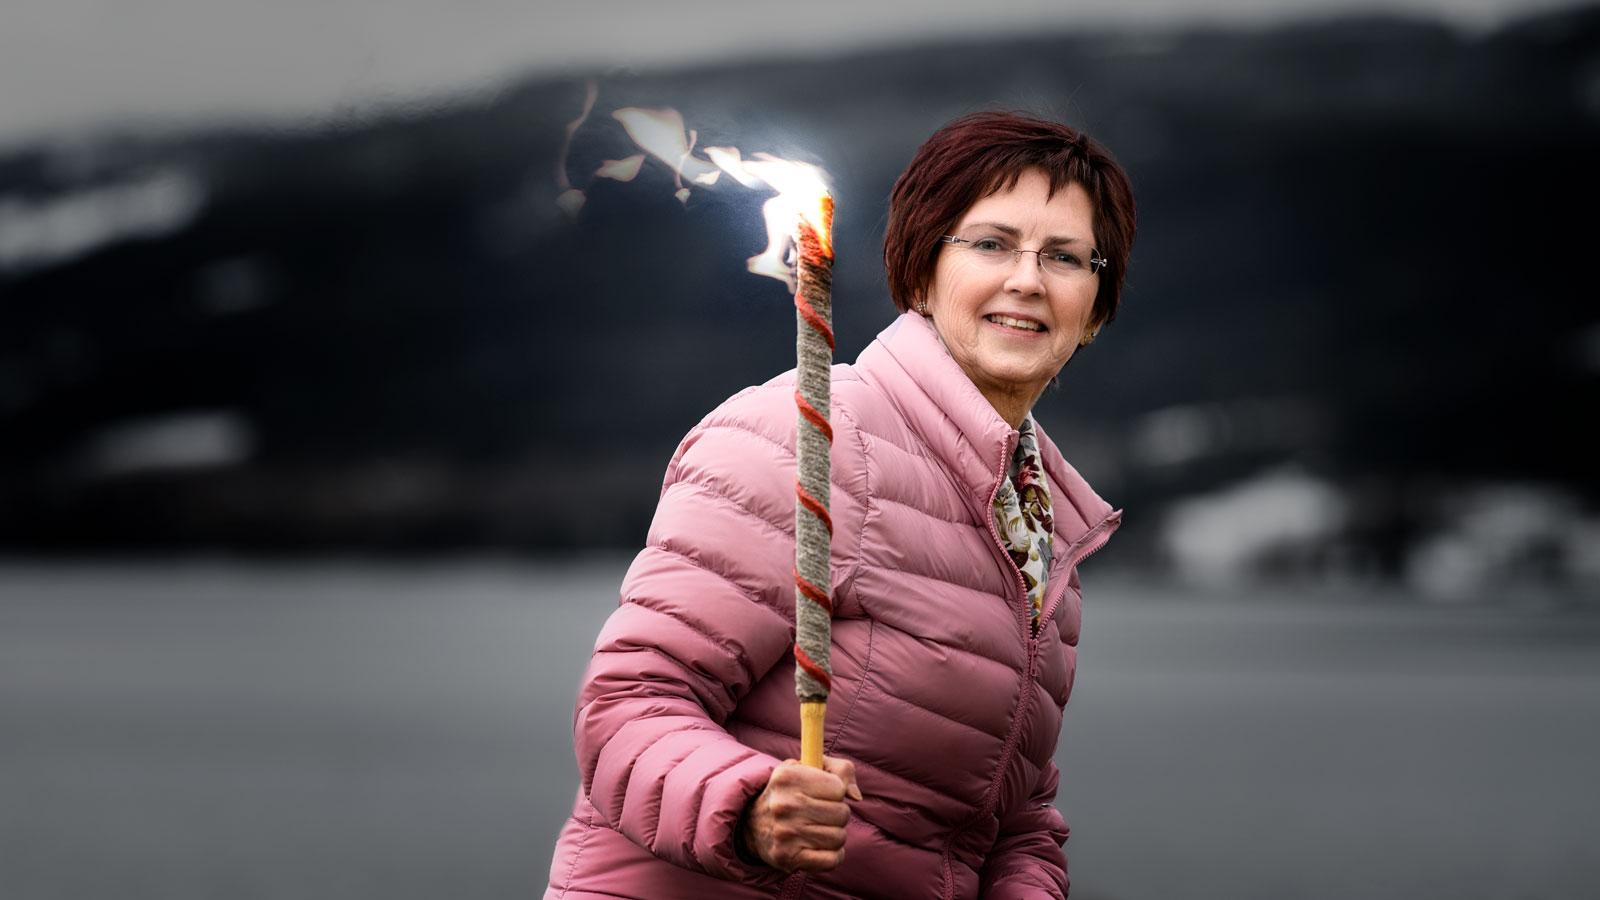 Daglig leder for Søndre Land Frivilligsentral, Marit Hultmann inviterer til Fjordlangs